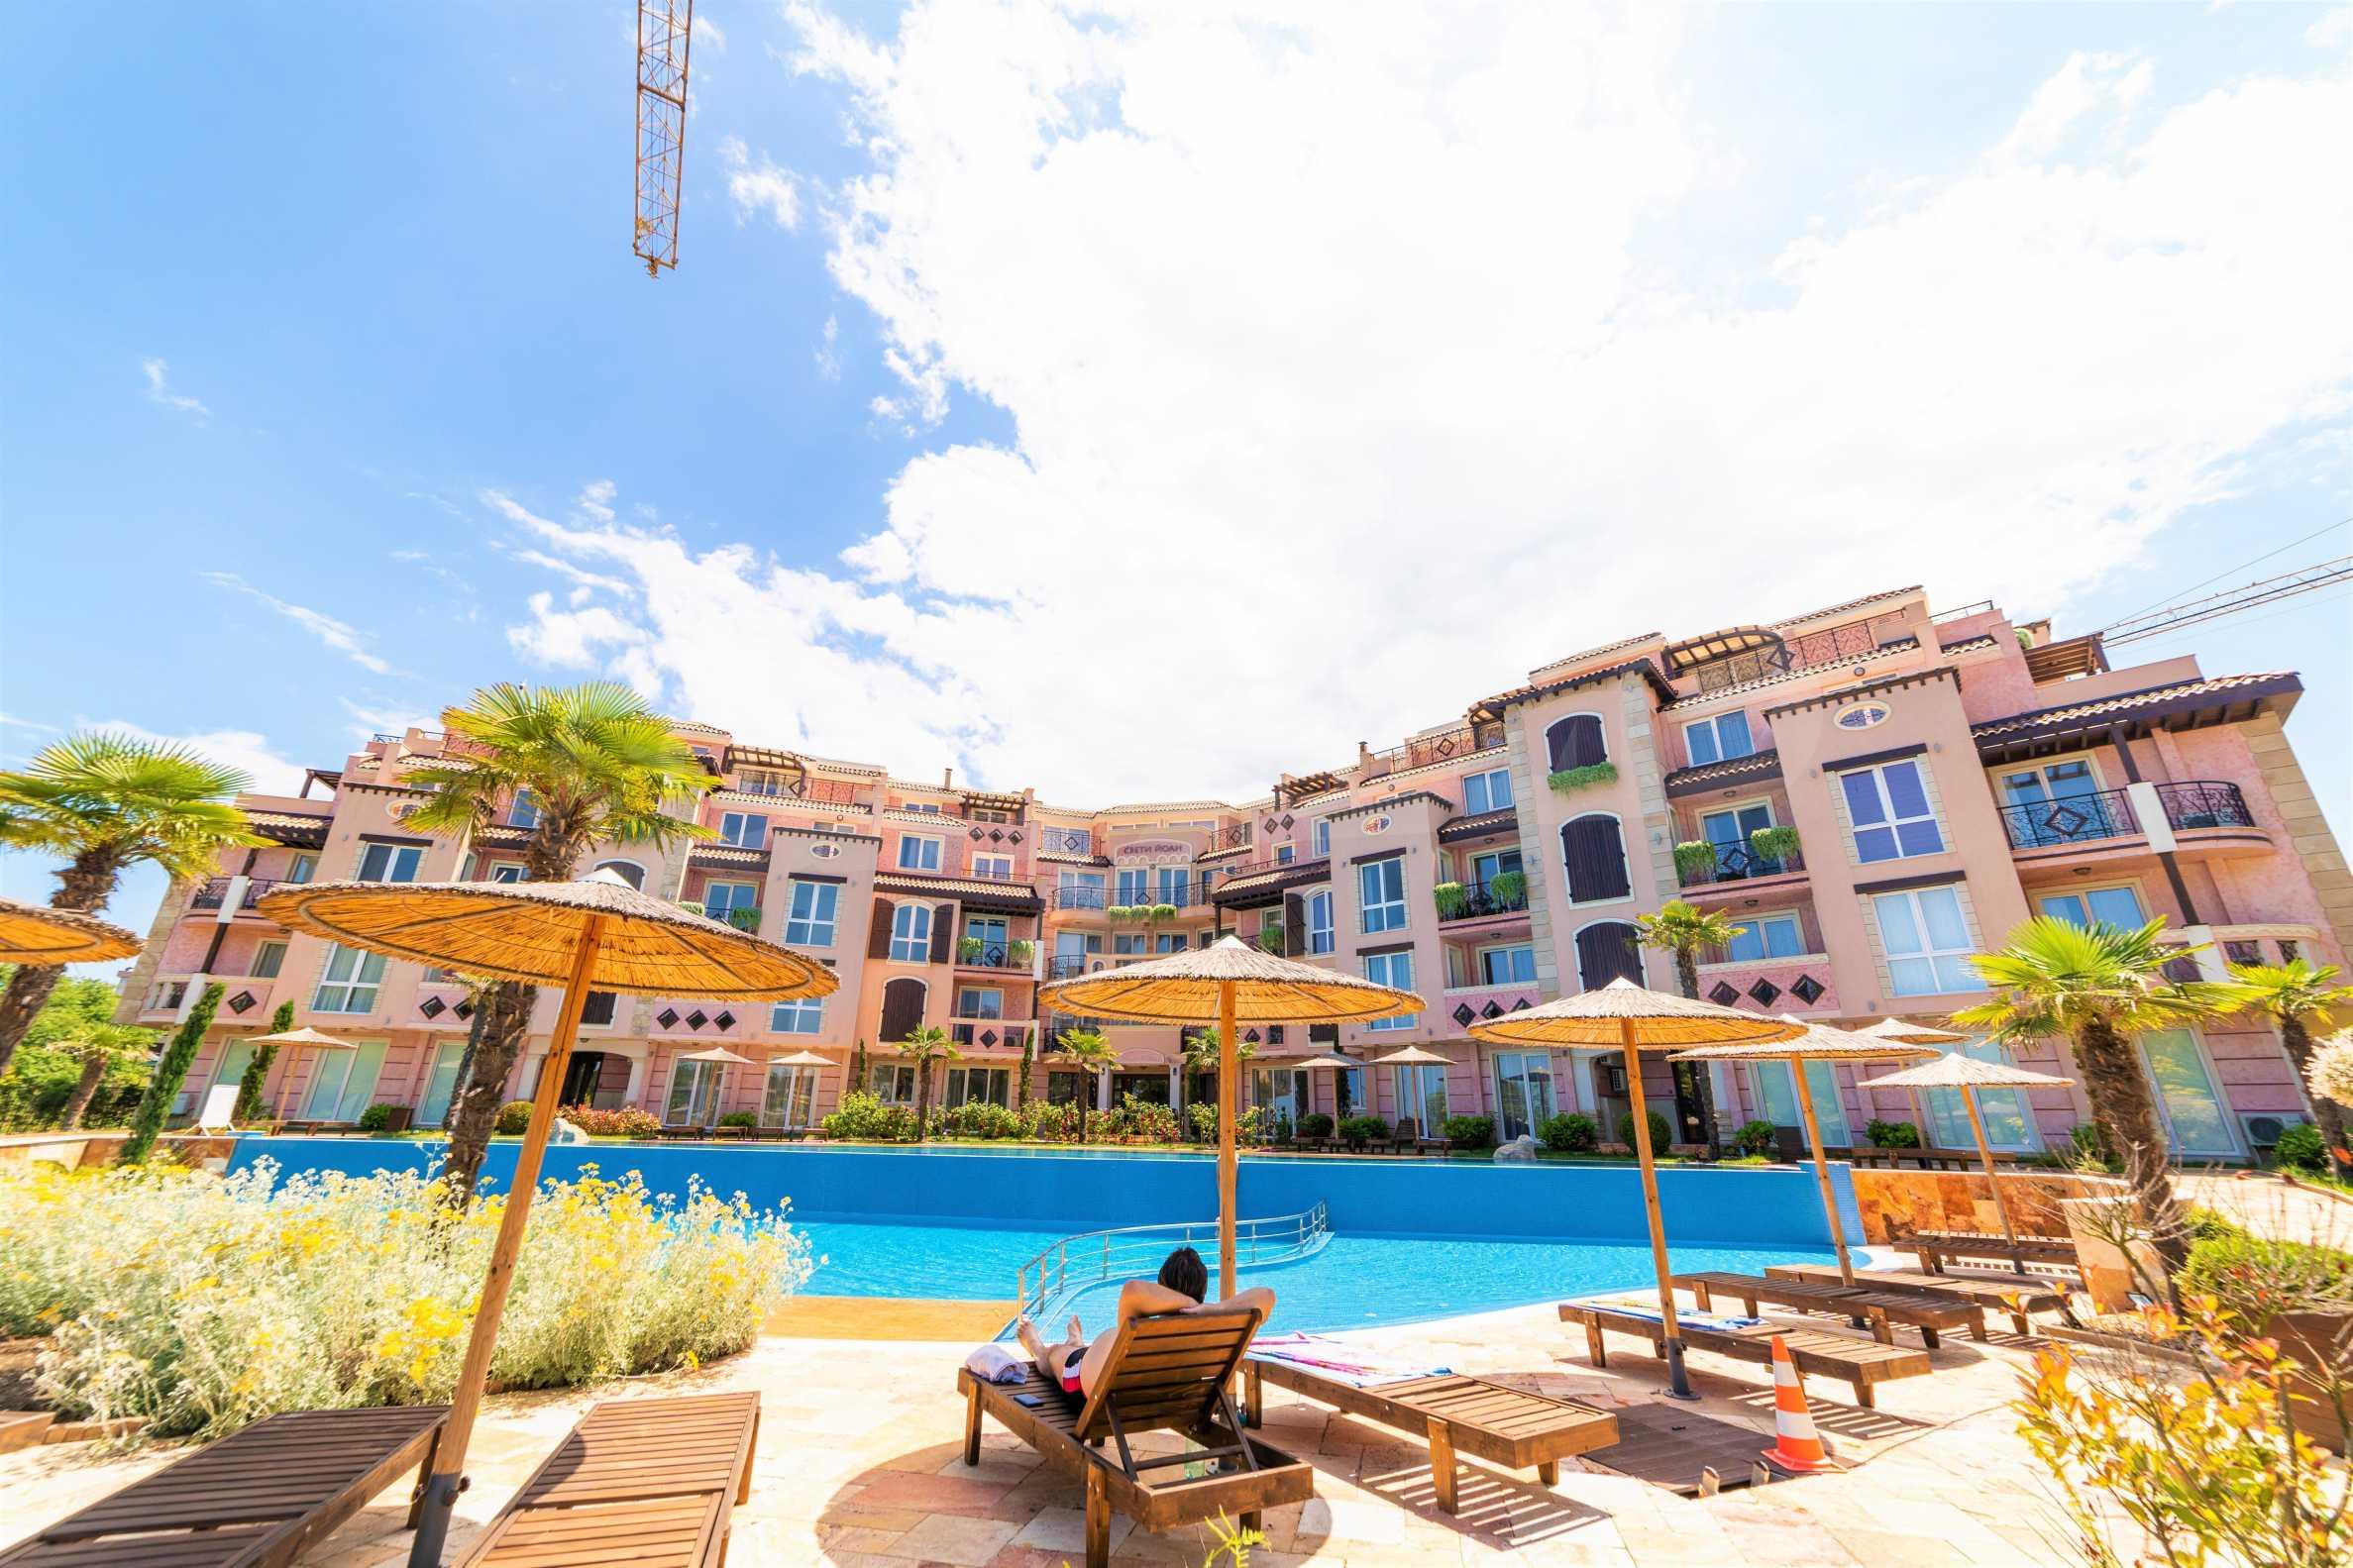 New 1-bedroom apartment in a coastal complex by the Kavatsite Beach (Sozopol) 9